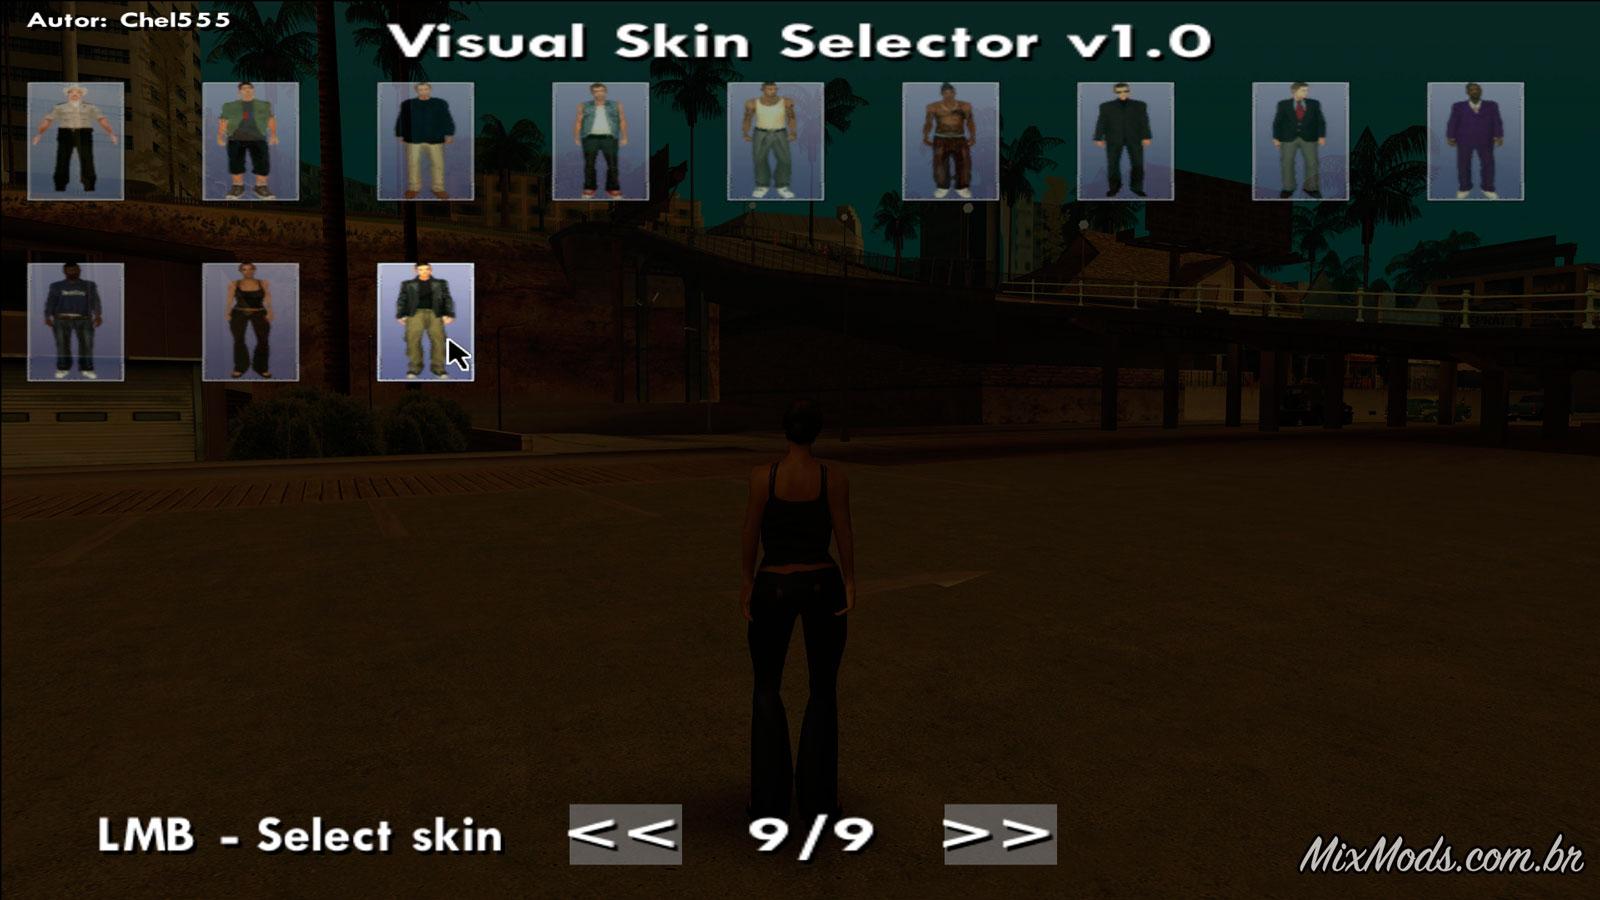 Gta san andreas visual skin selector v1. 1 mod gtainside. Com.